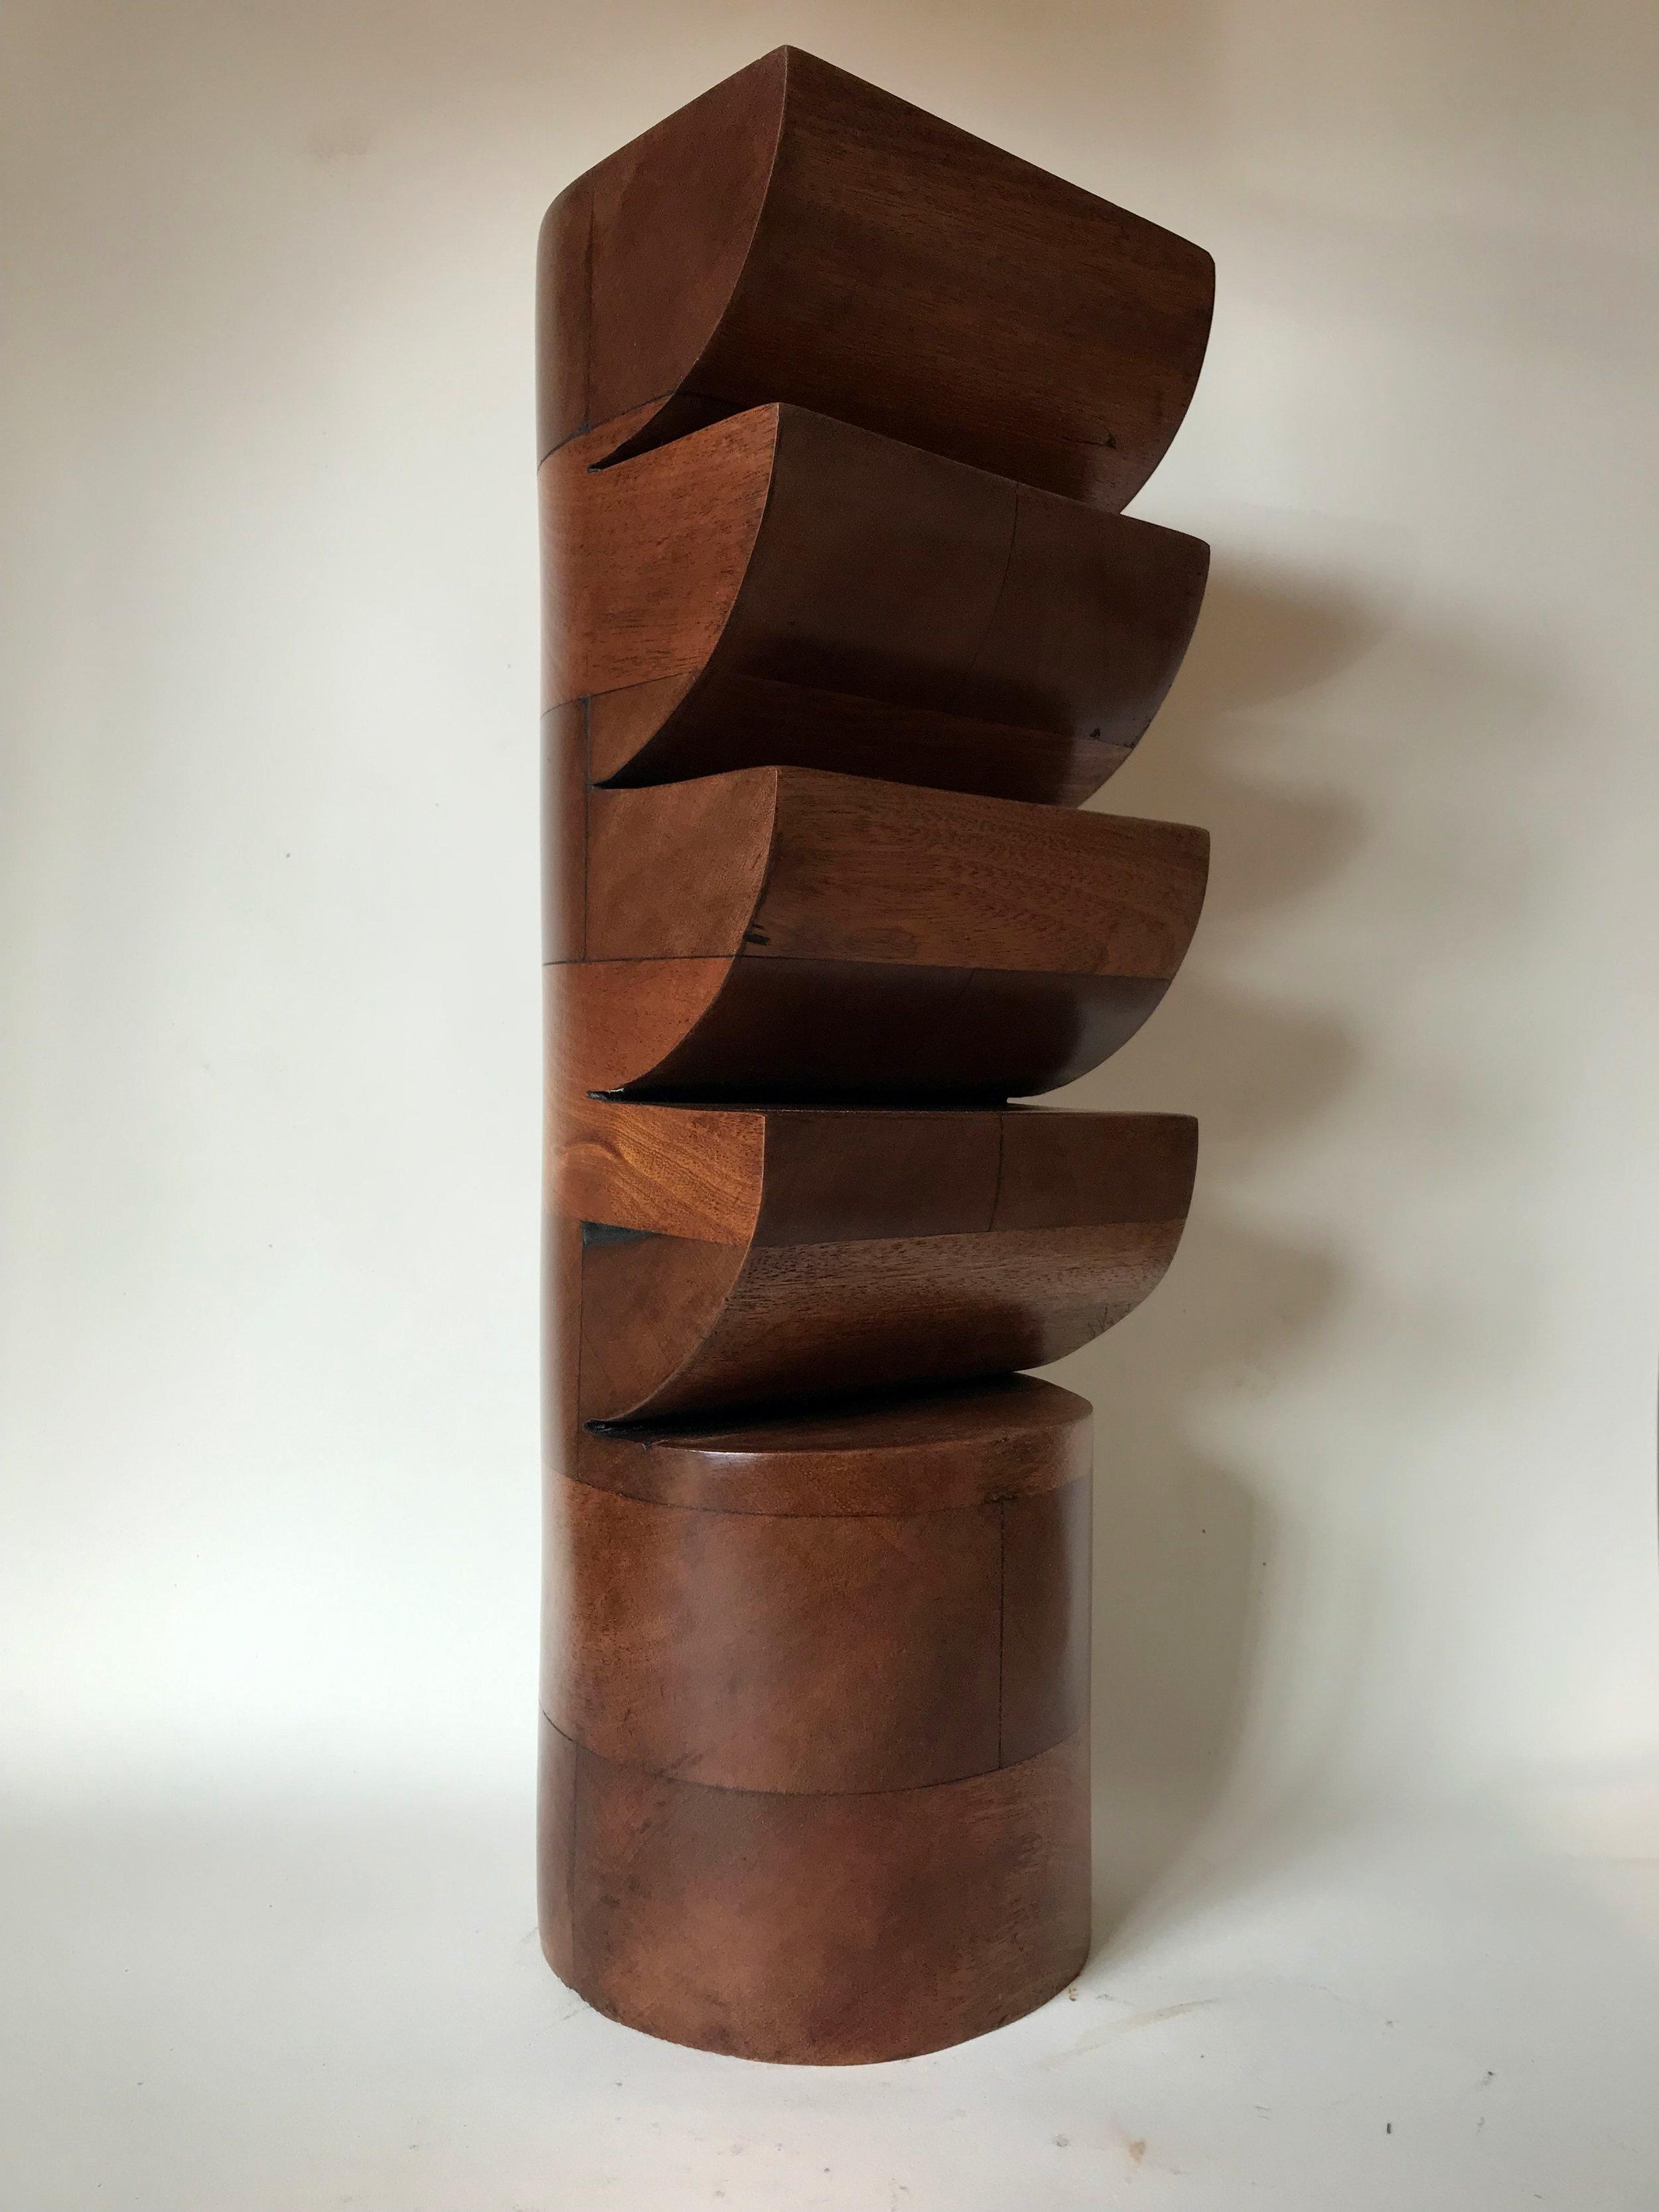 'Ladderback', Sapele wood, 14x14x42cm